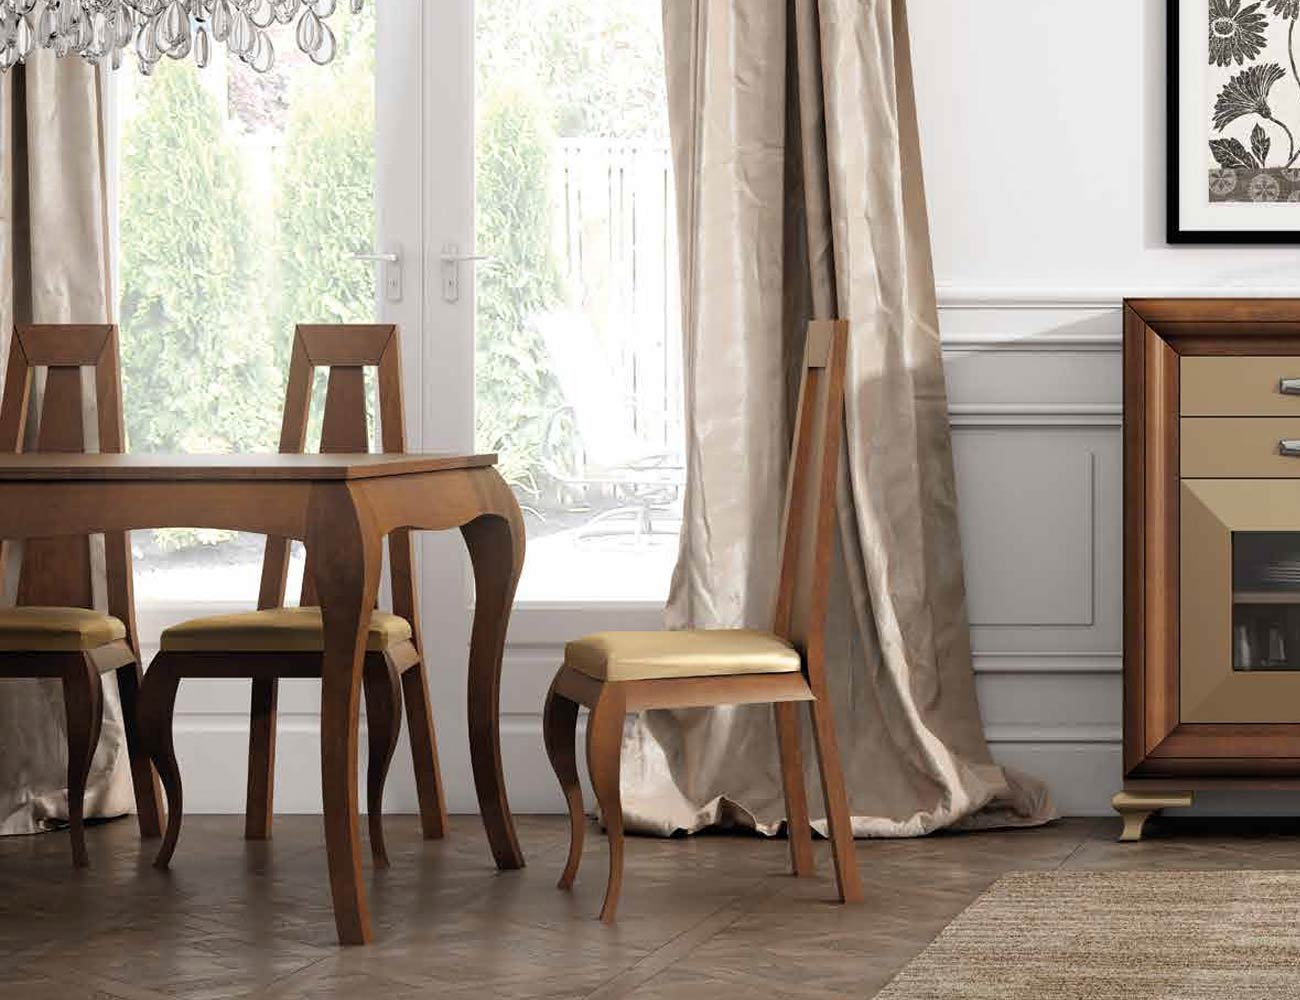 Mesa sillas composicion 19